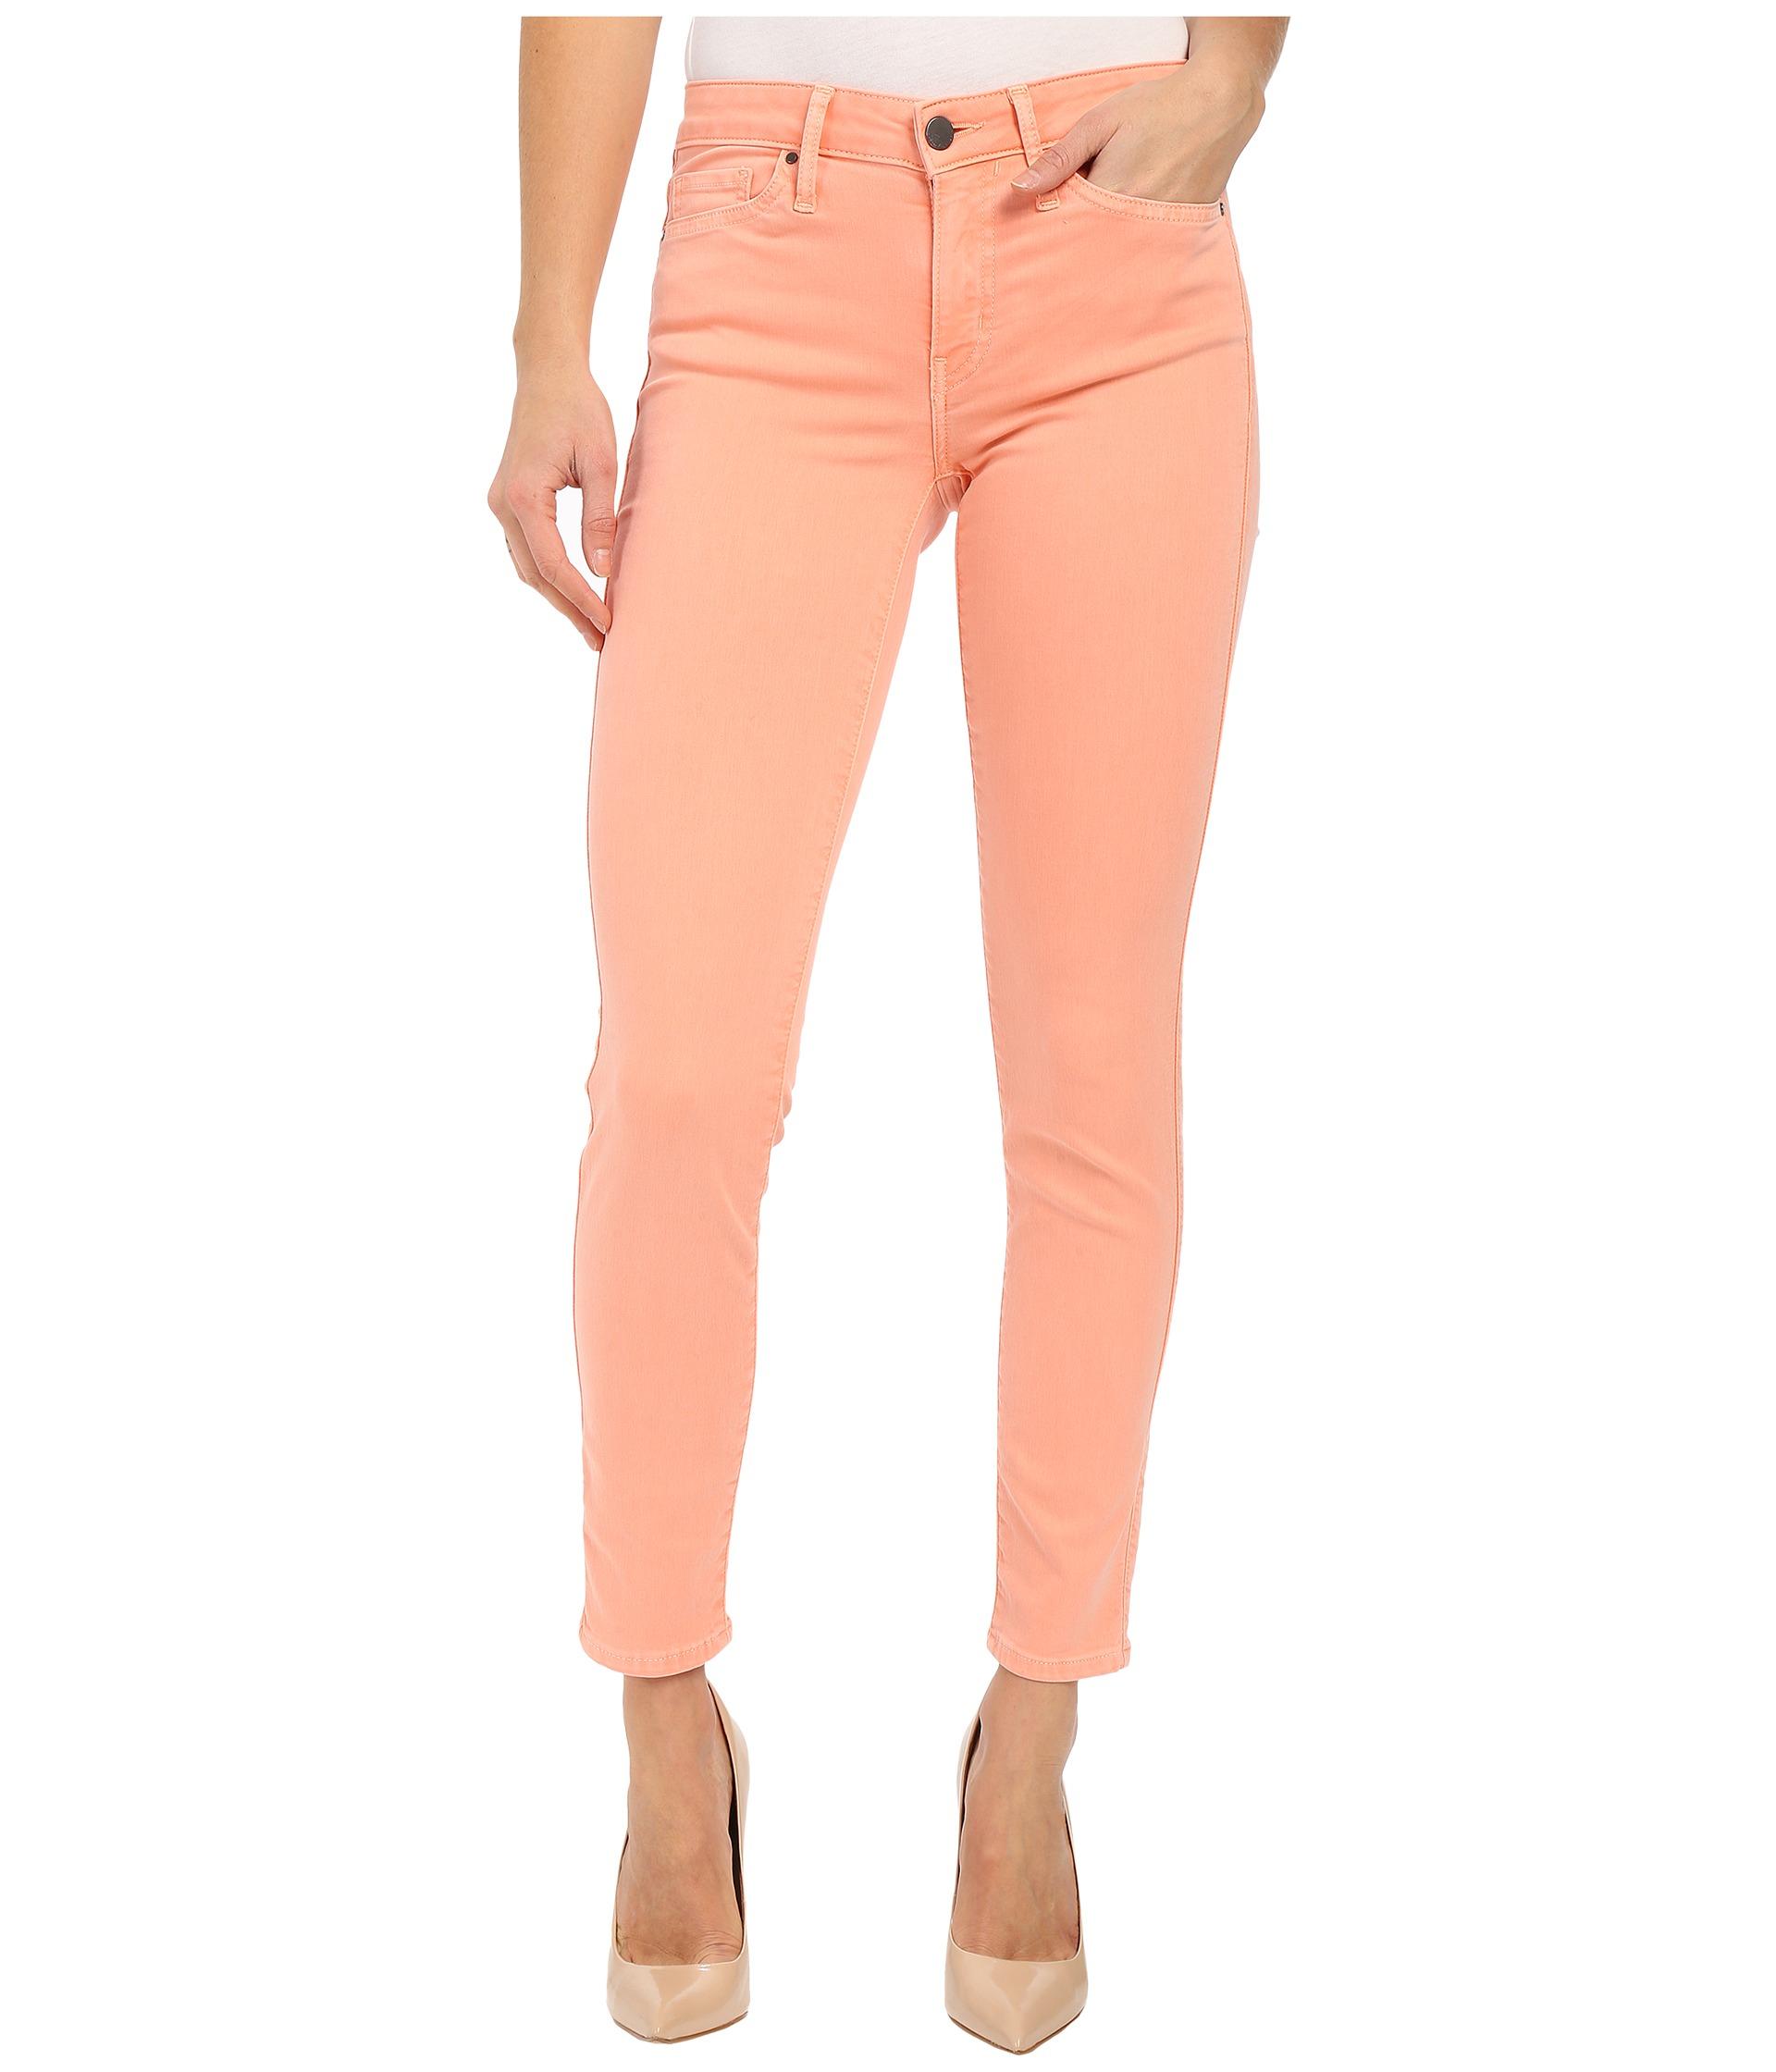 Lyst - Calvin Klein Ankle Skinny Jeans - Rodez In Desert Flower in ... 1ace41bb44